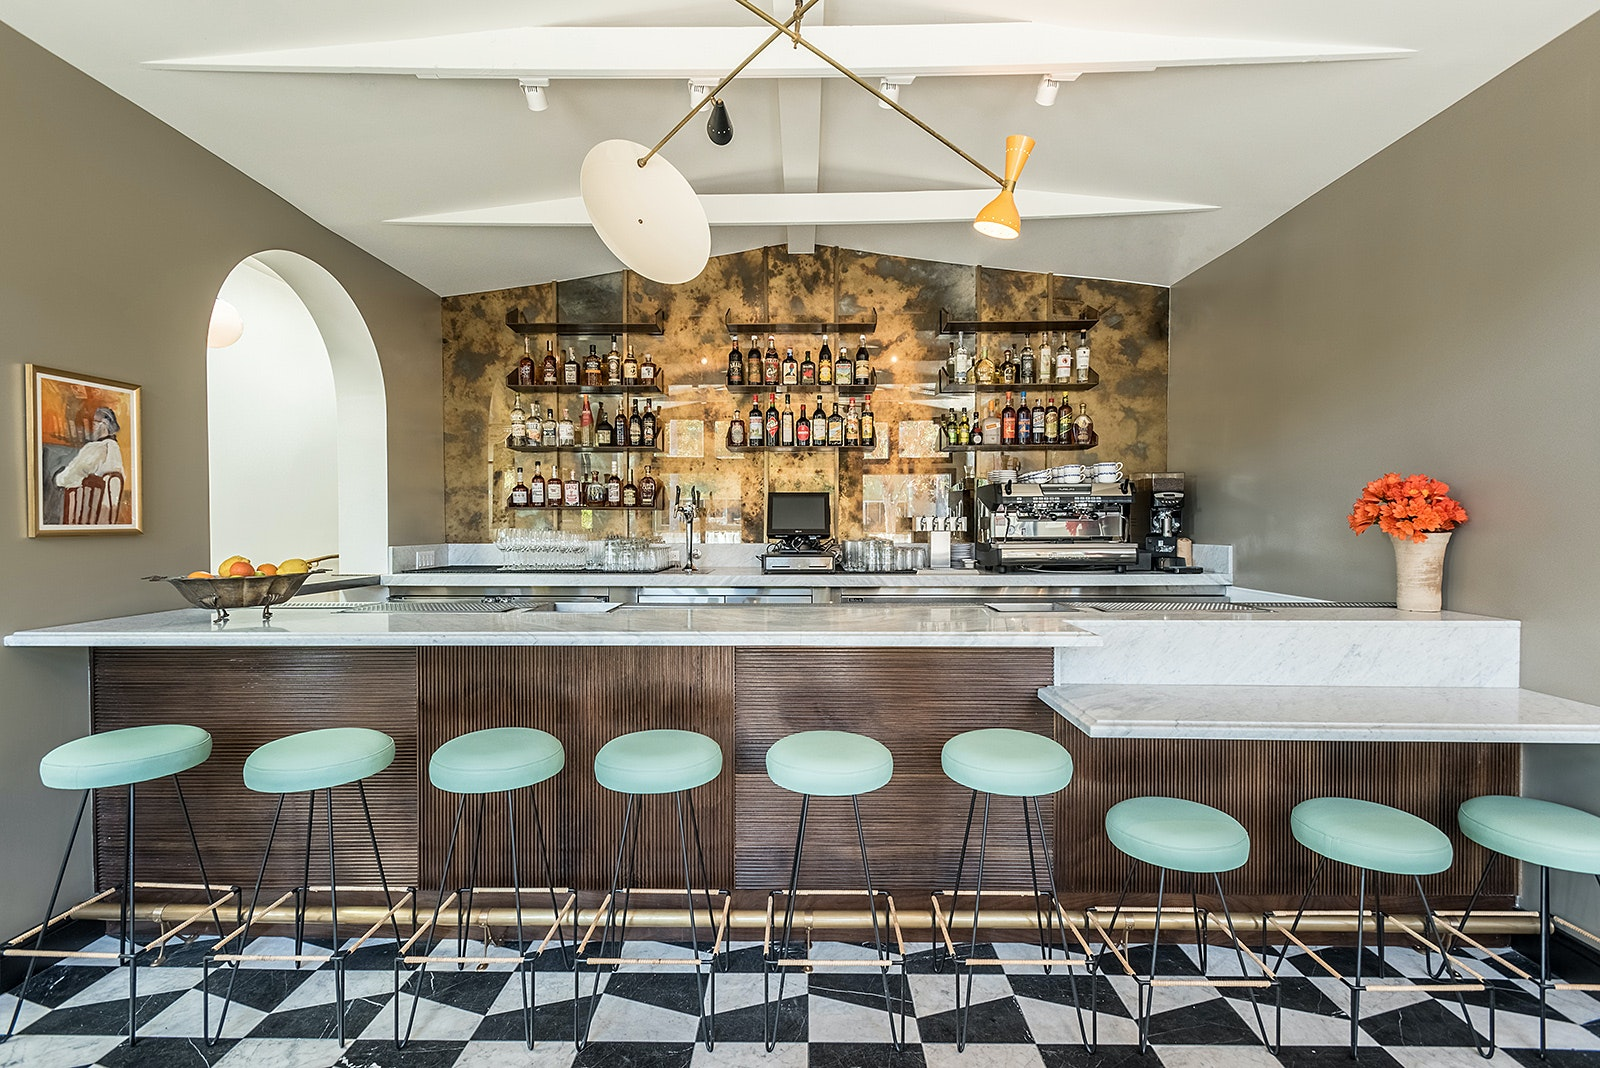 Peoples choice award restaurant felix trattoria venice ca designed by wendy haworth design studio david hertz faia